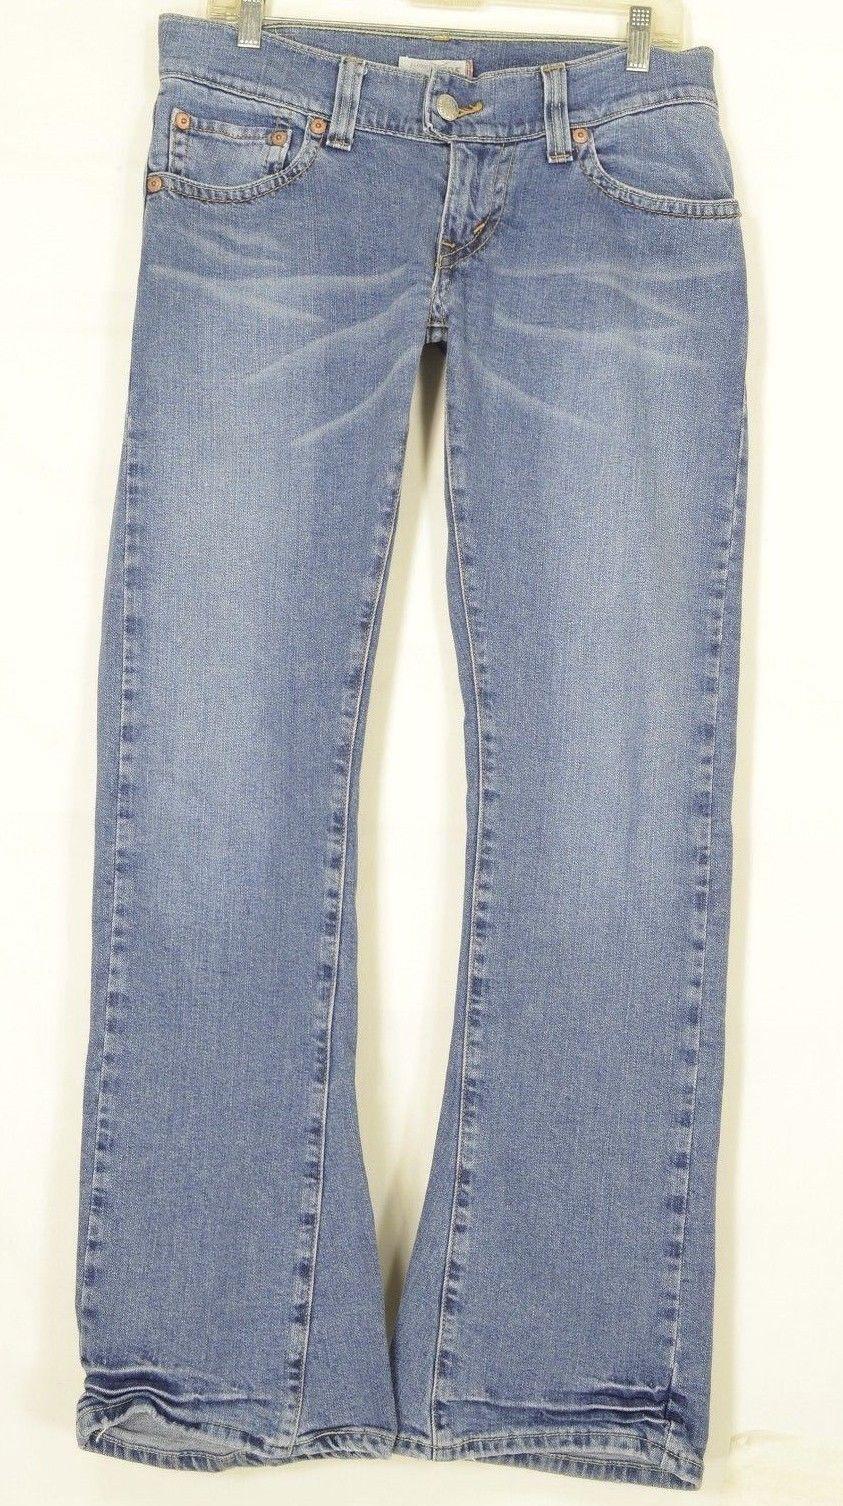 Levi 504 jeans 20 x 32 slouch flap pockets wrinkled leg bottom med wash W42 L32